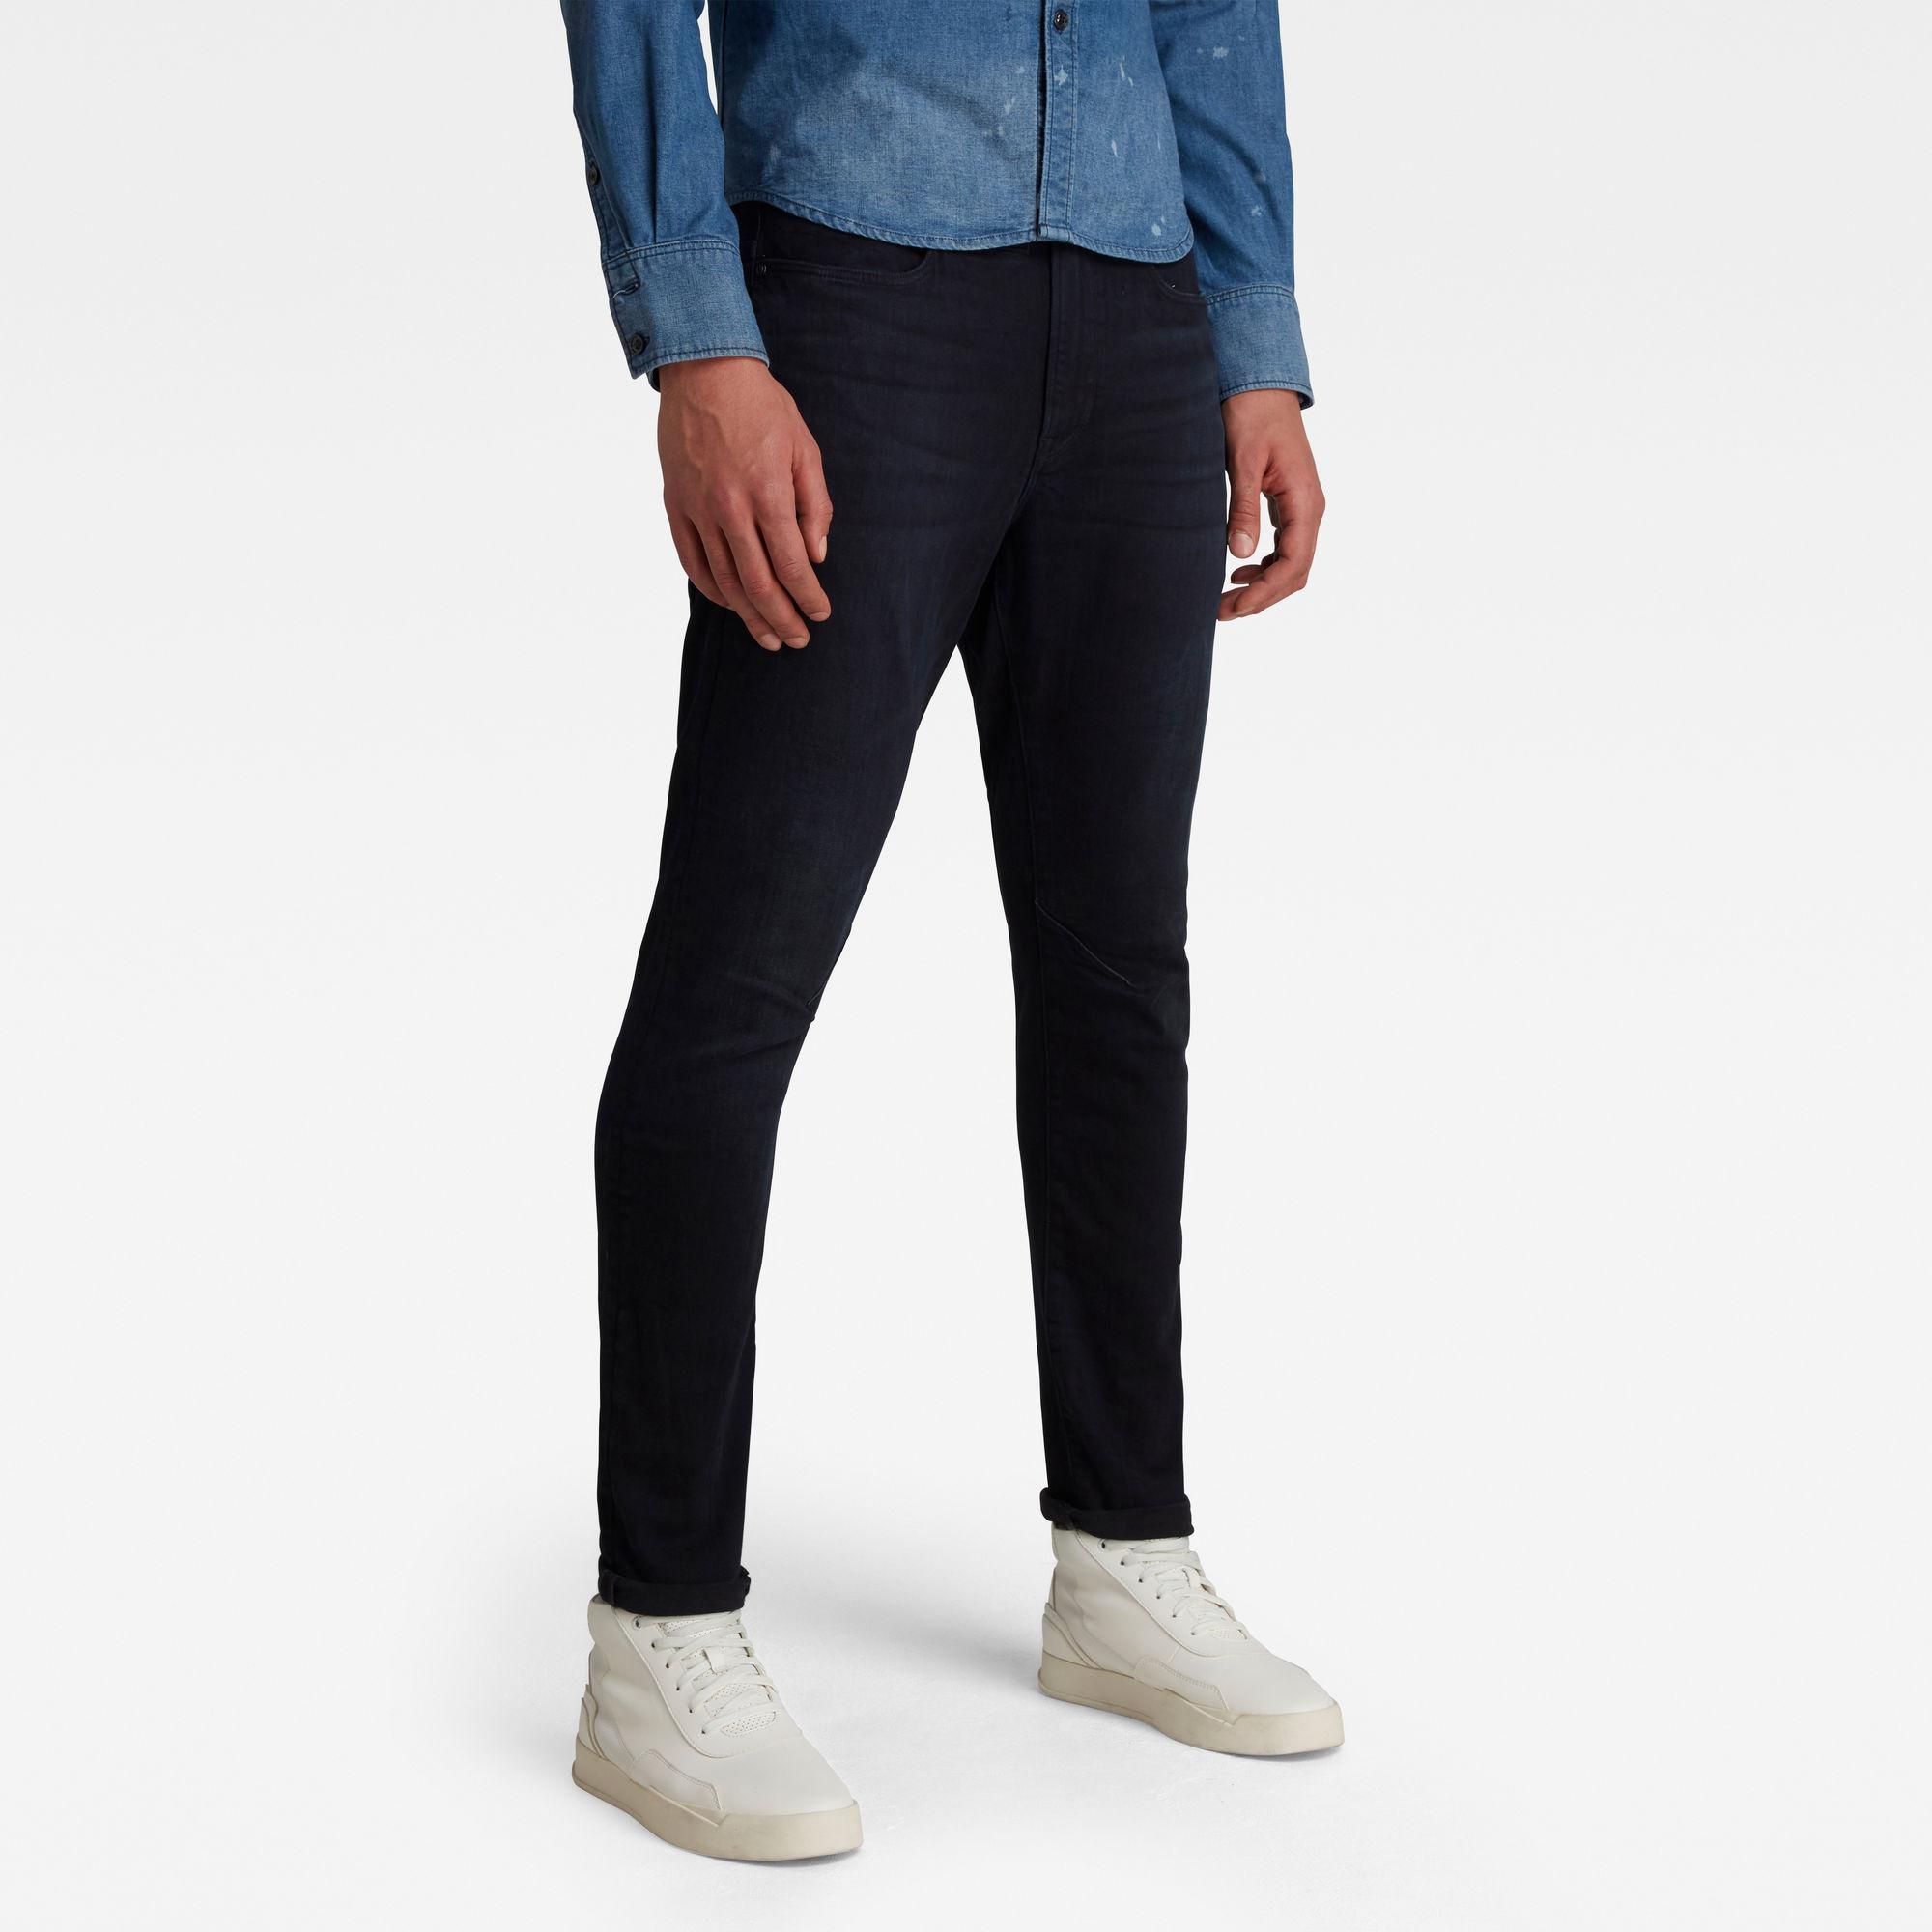 G-Star RAW Heren D-Staq 3D Skinny Jeans Donkerblauw